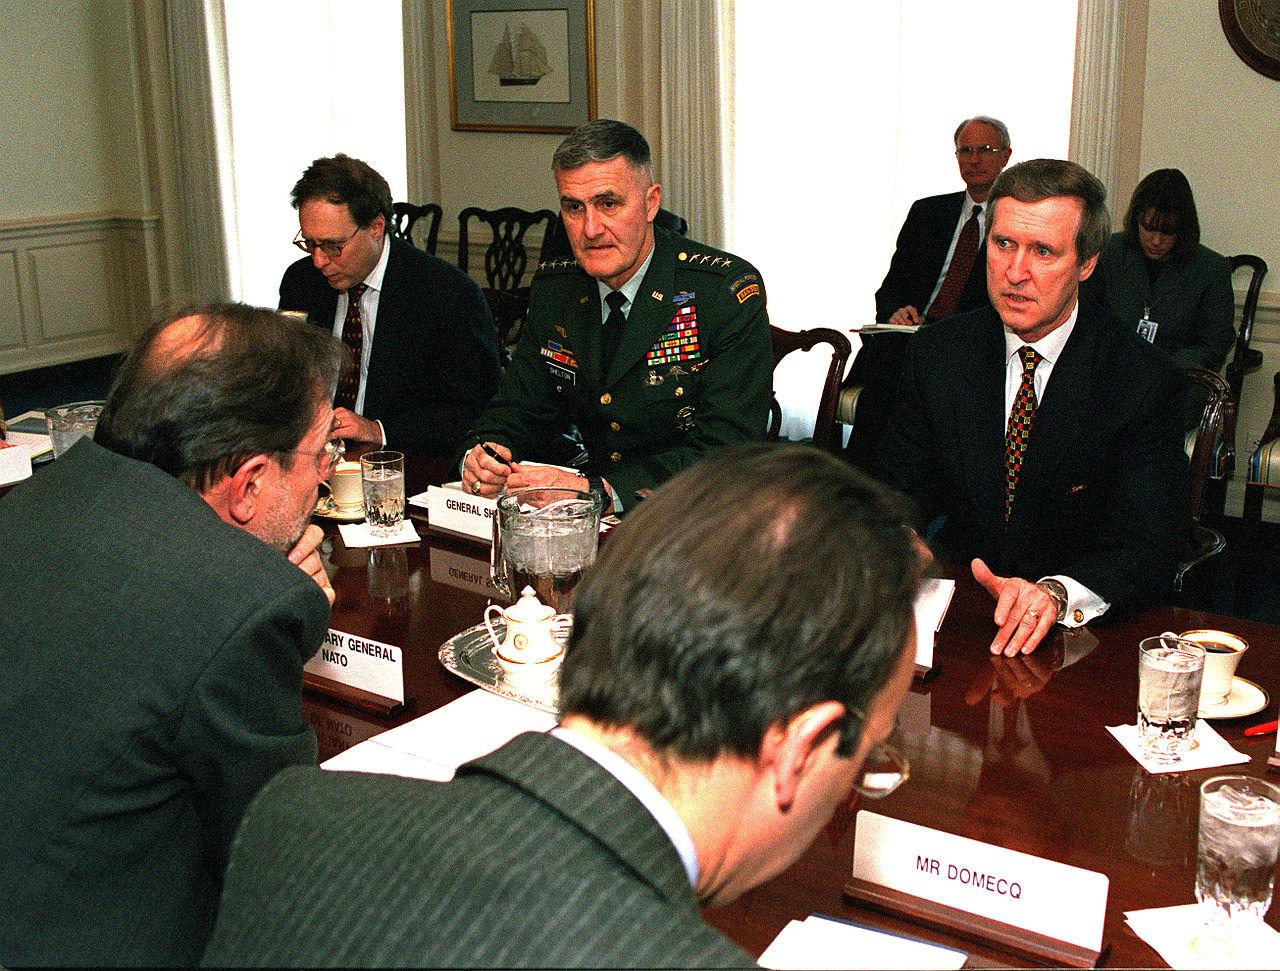 1280px-Pentagon_meeting_March_15_1999,_990315-D-9880W-016.jpg